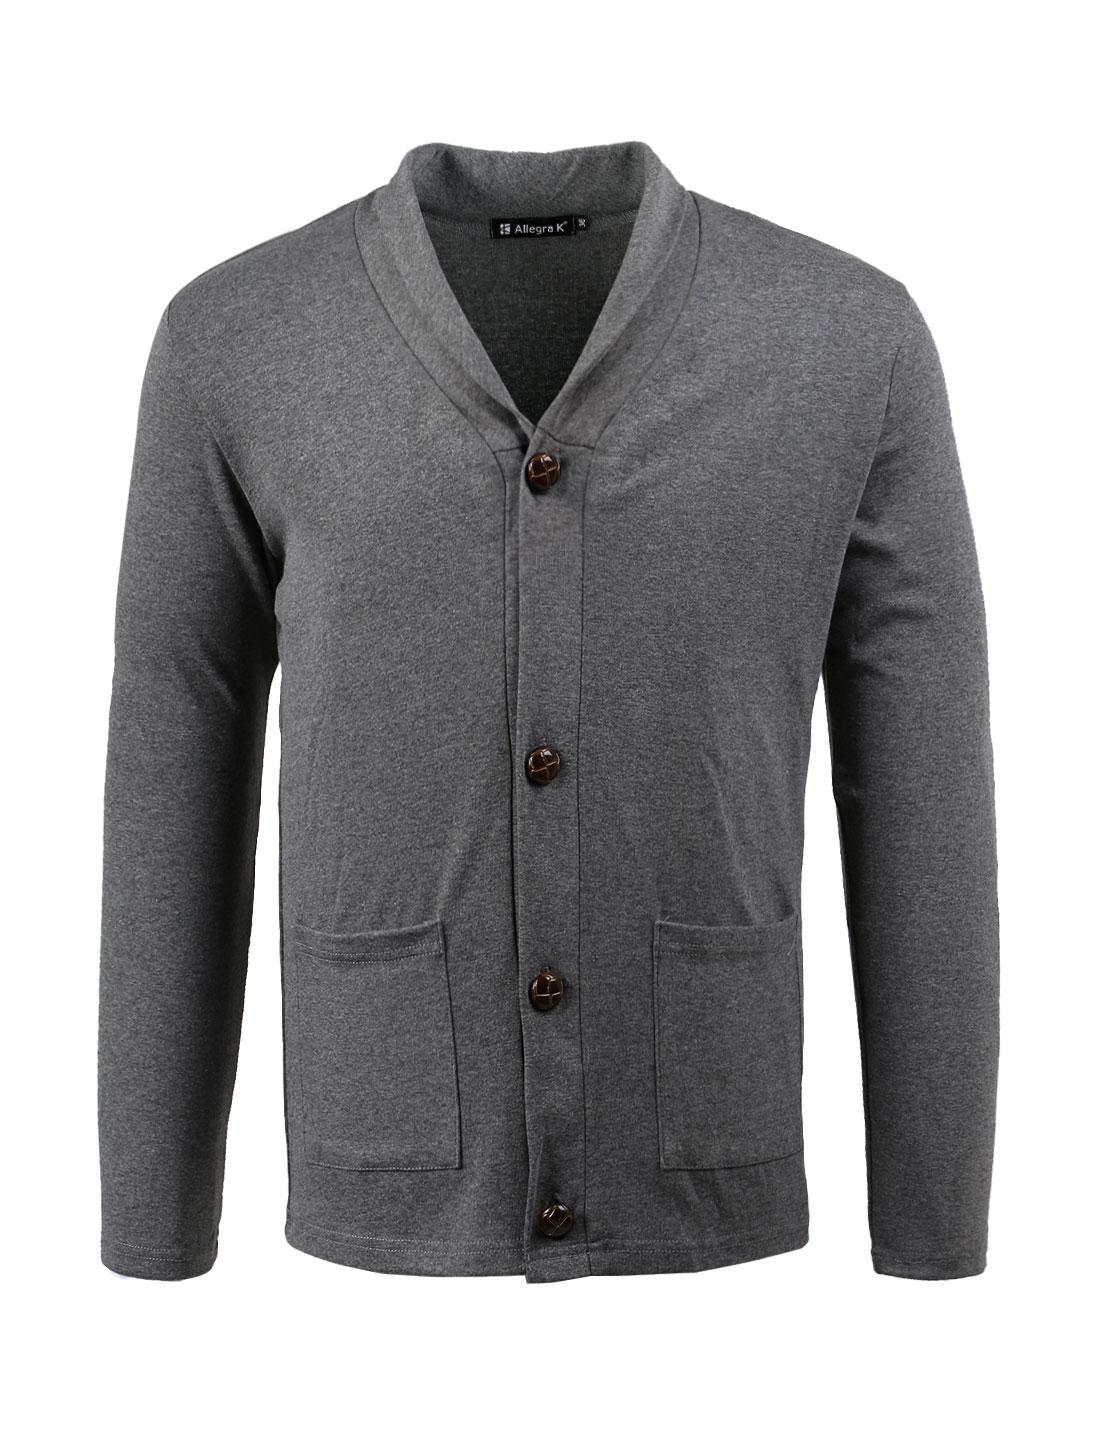 Men Button Closure Long Sleeves Knit Cardigan Dark Gray M